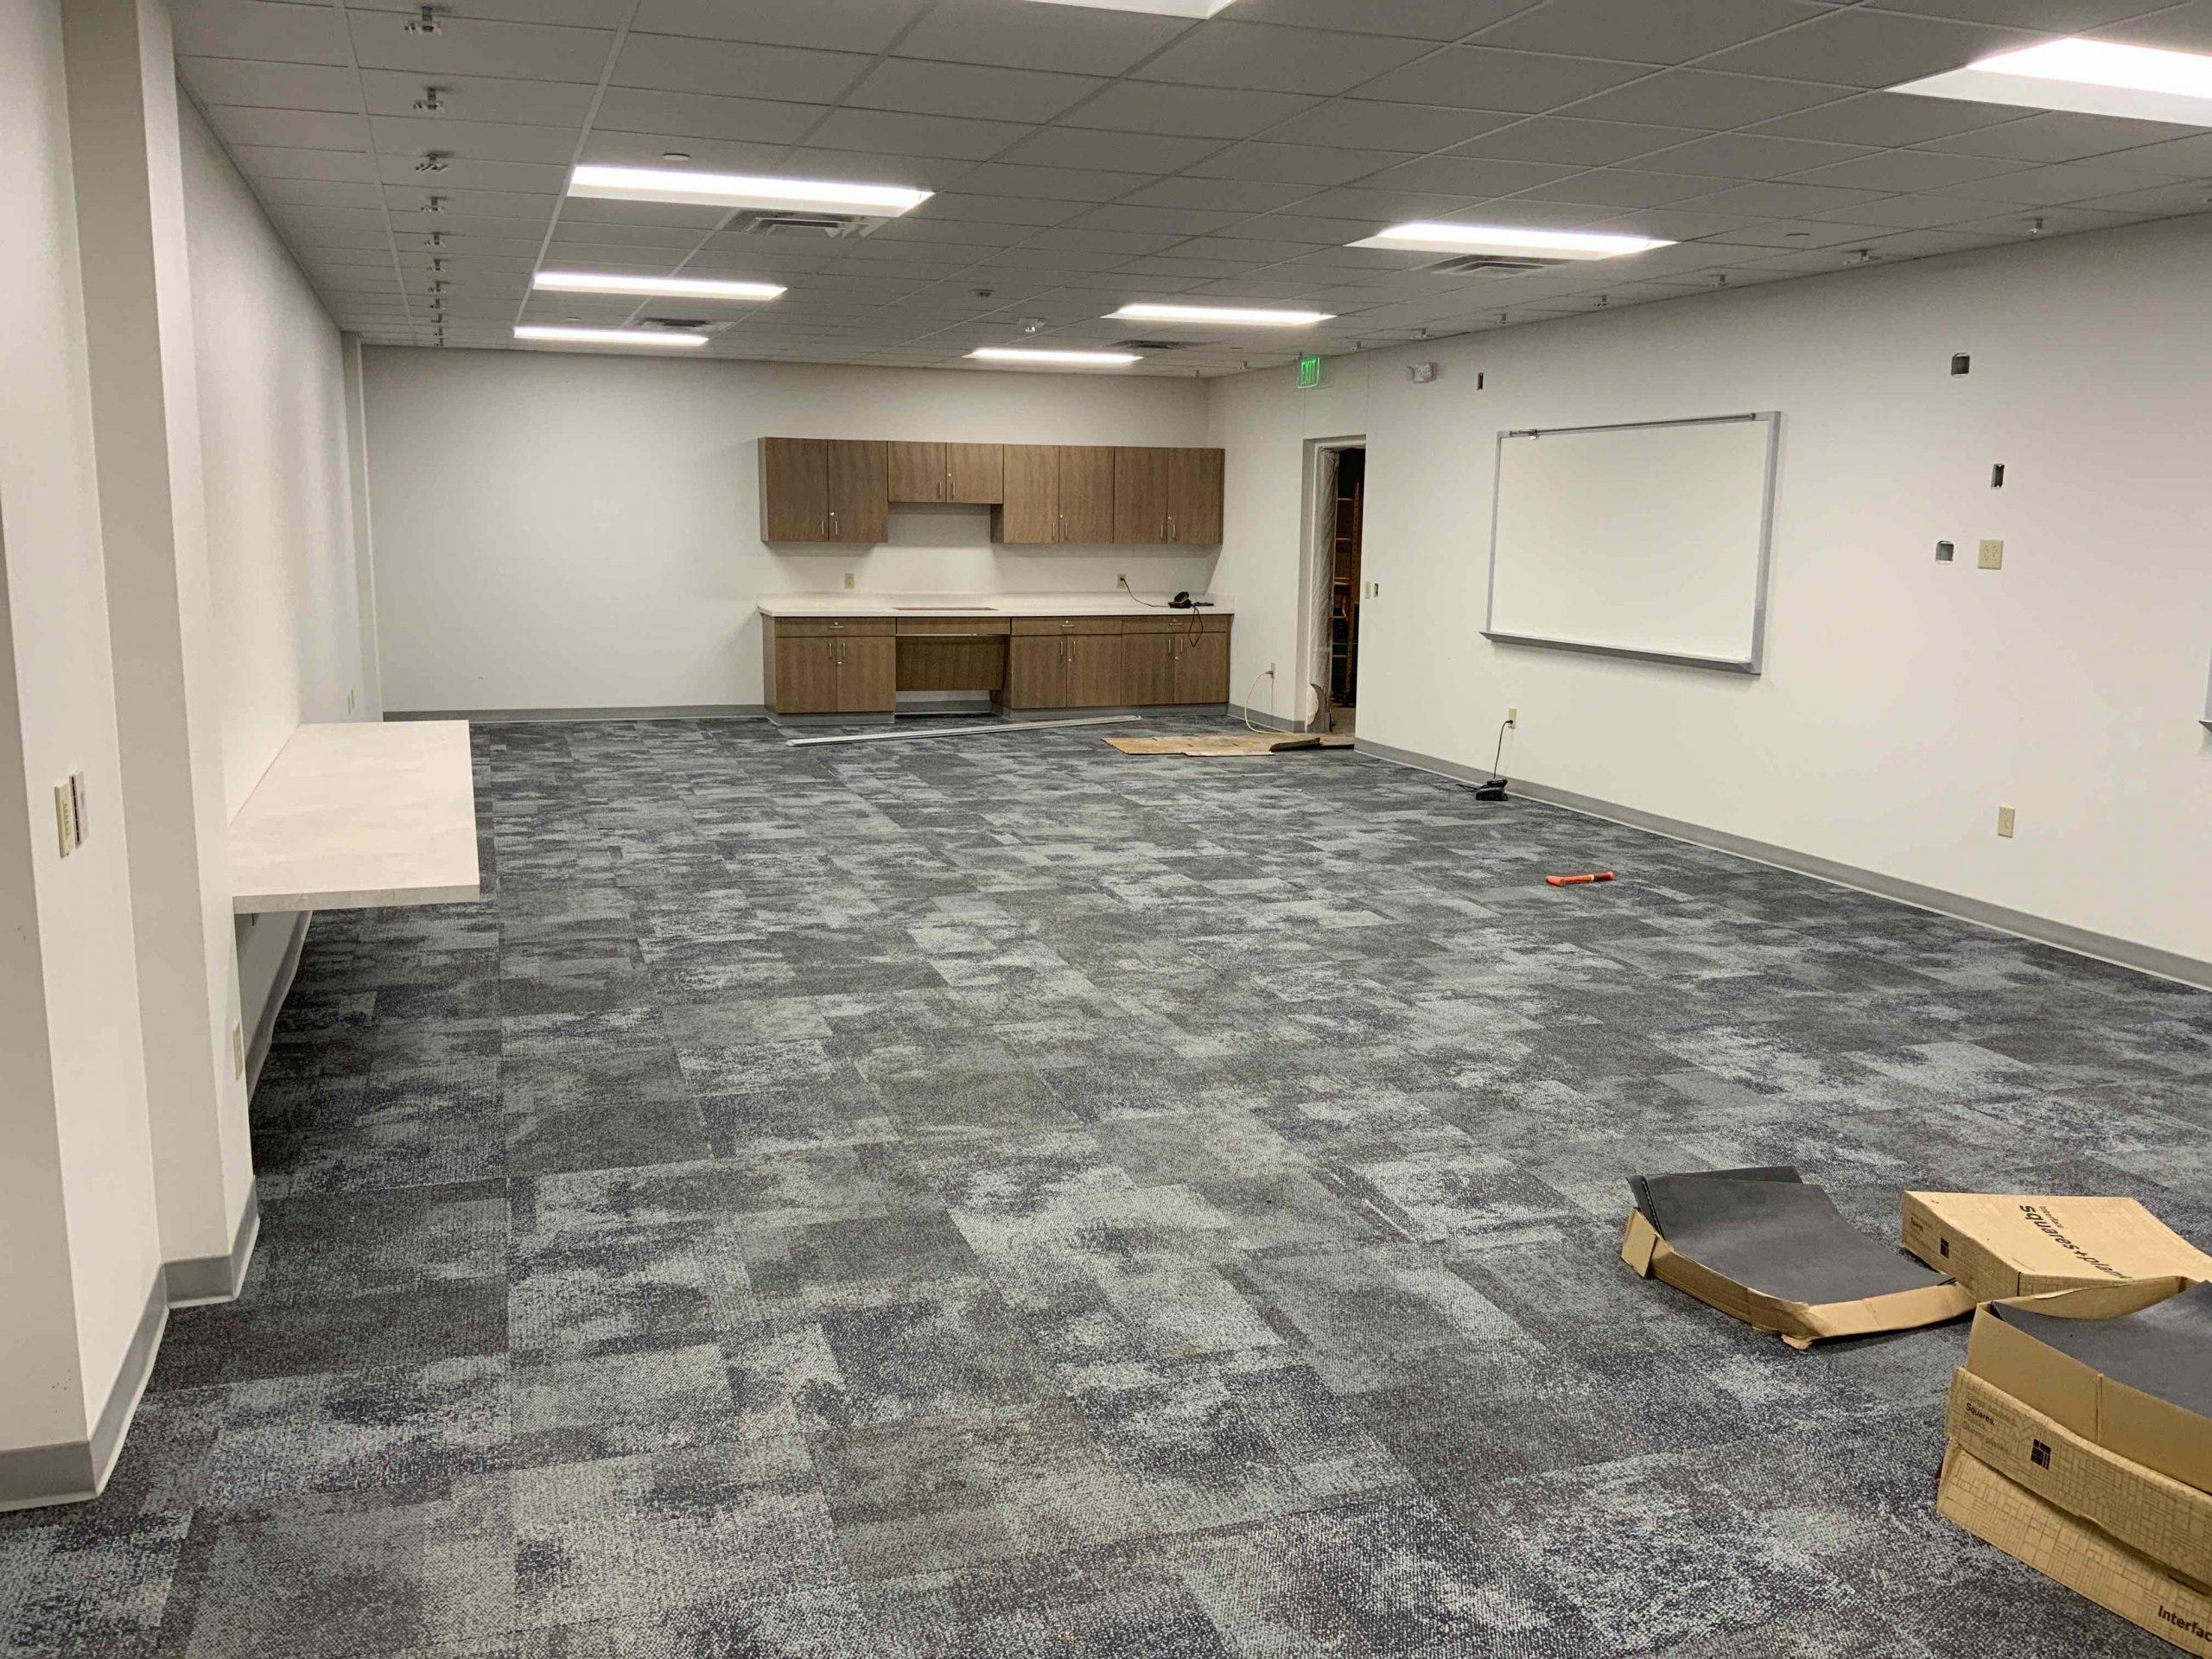 Classroom Renovation image 0